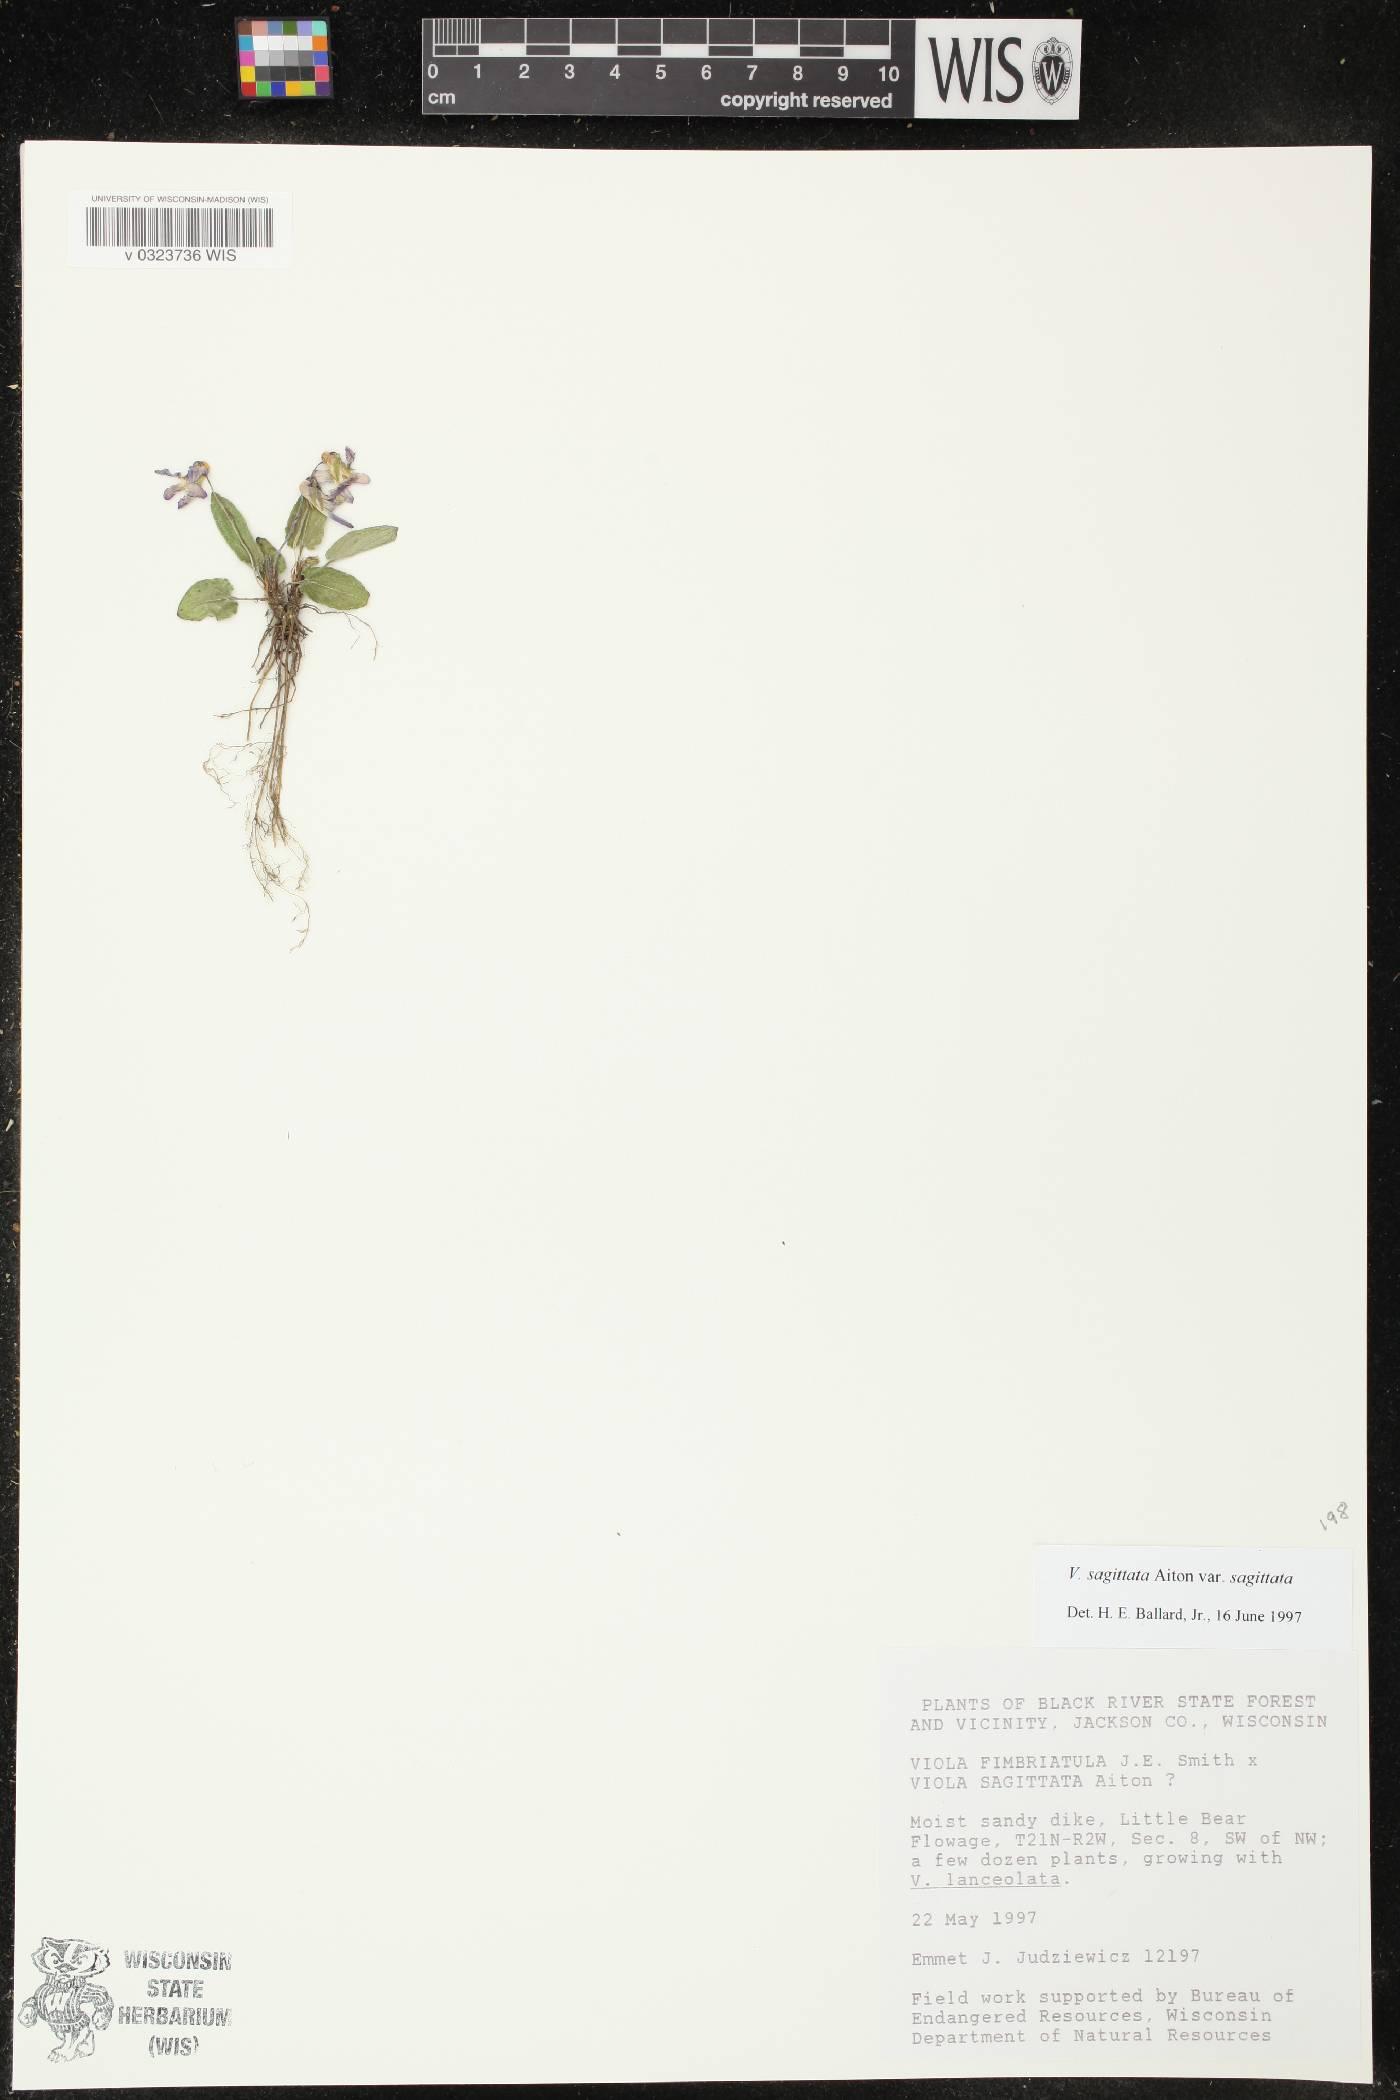 Viola sagittata var. sagittata image